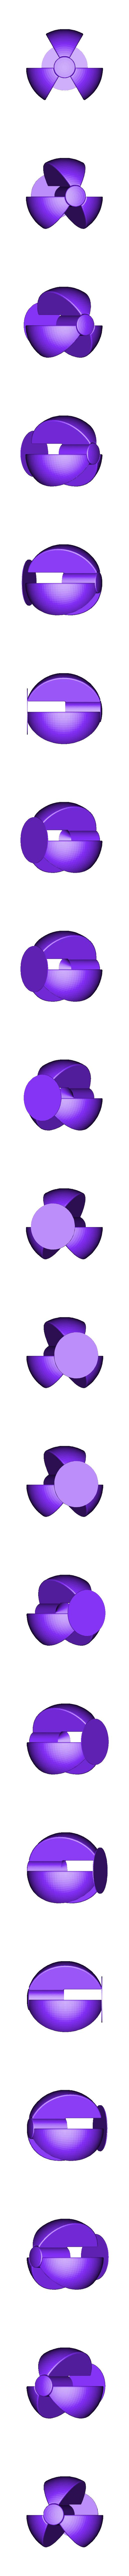 Ball_v0_base.stl Télécharger fichier STL Flexiphant • Modèle à imprimer en 3D, mcgybeer